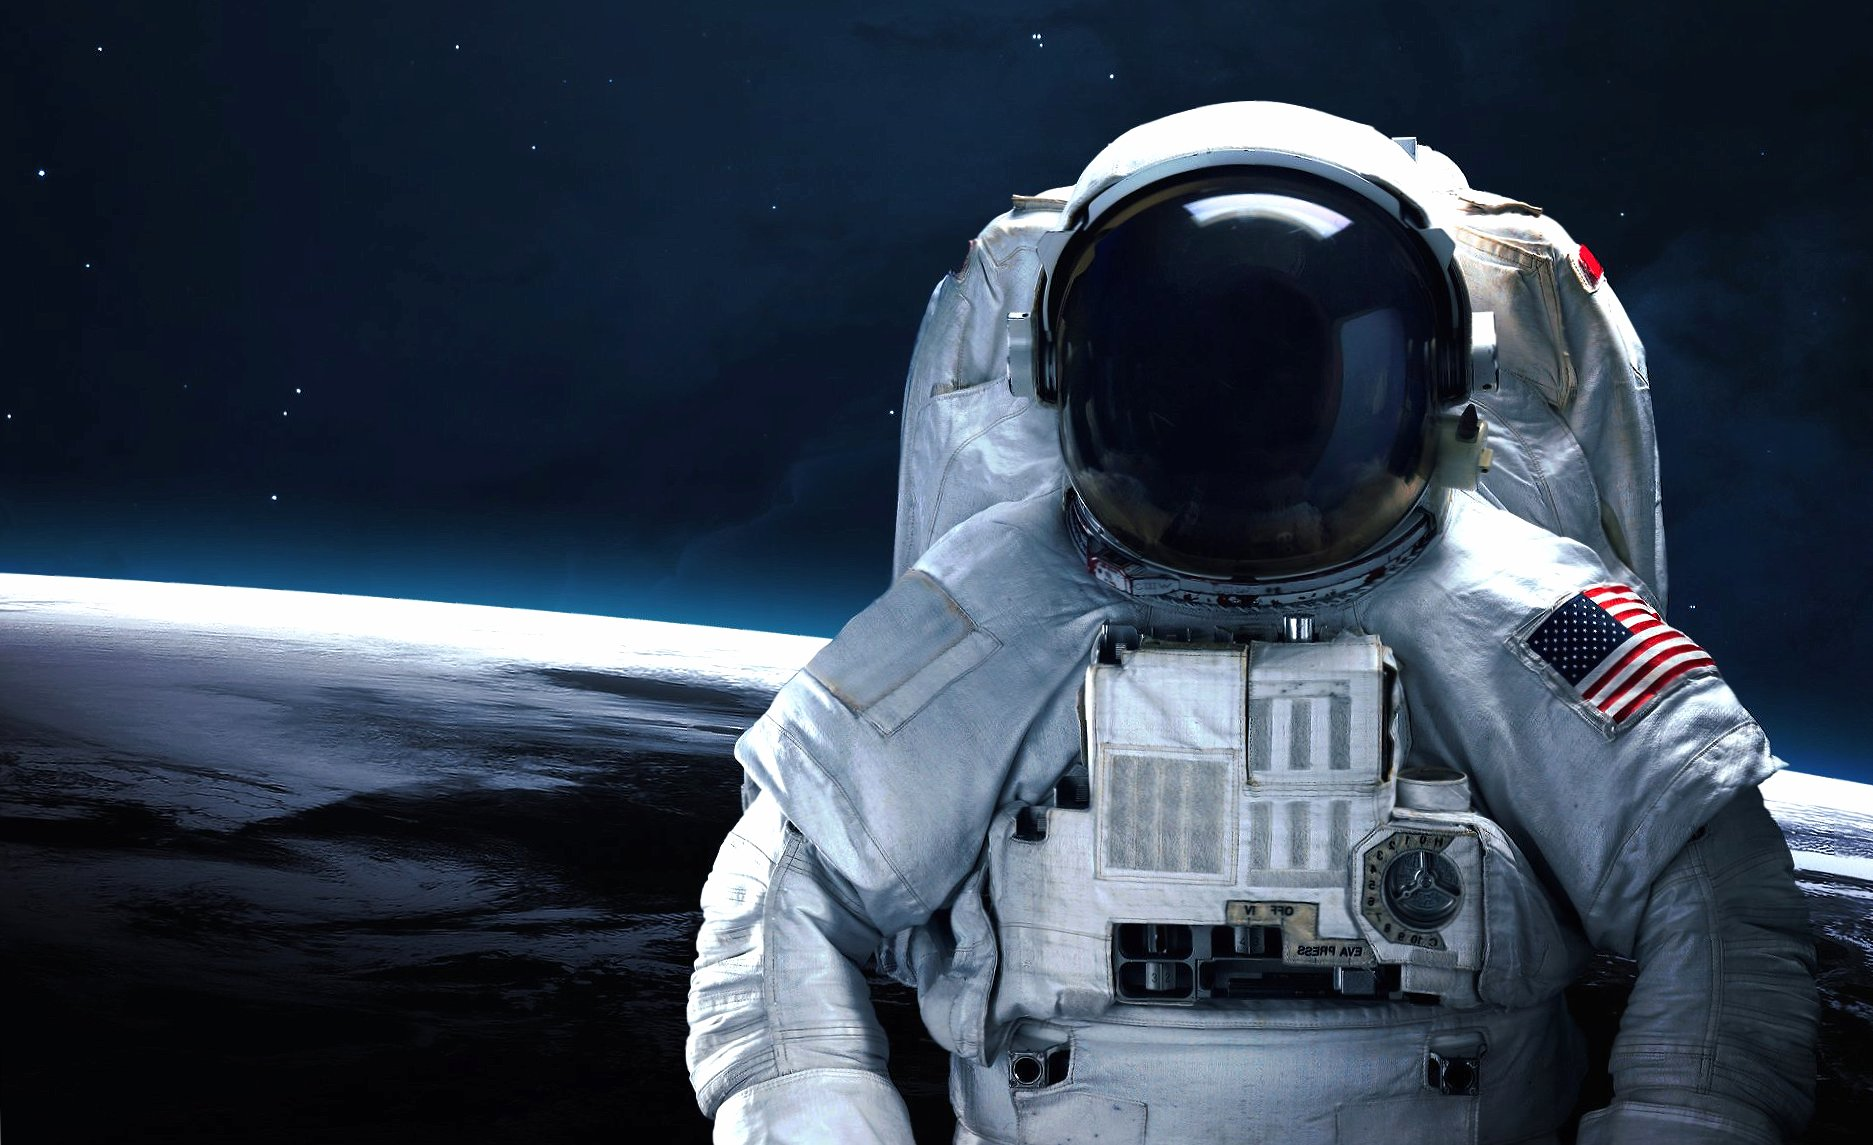 Astronaut Wallpaper HD Download